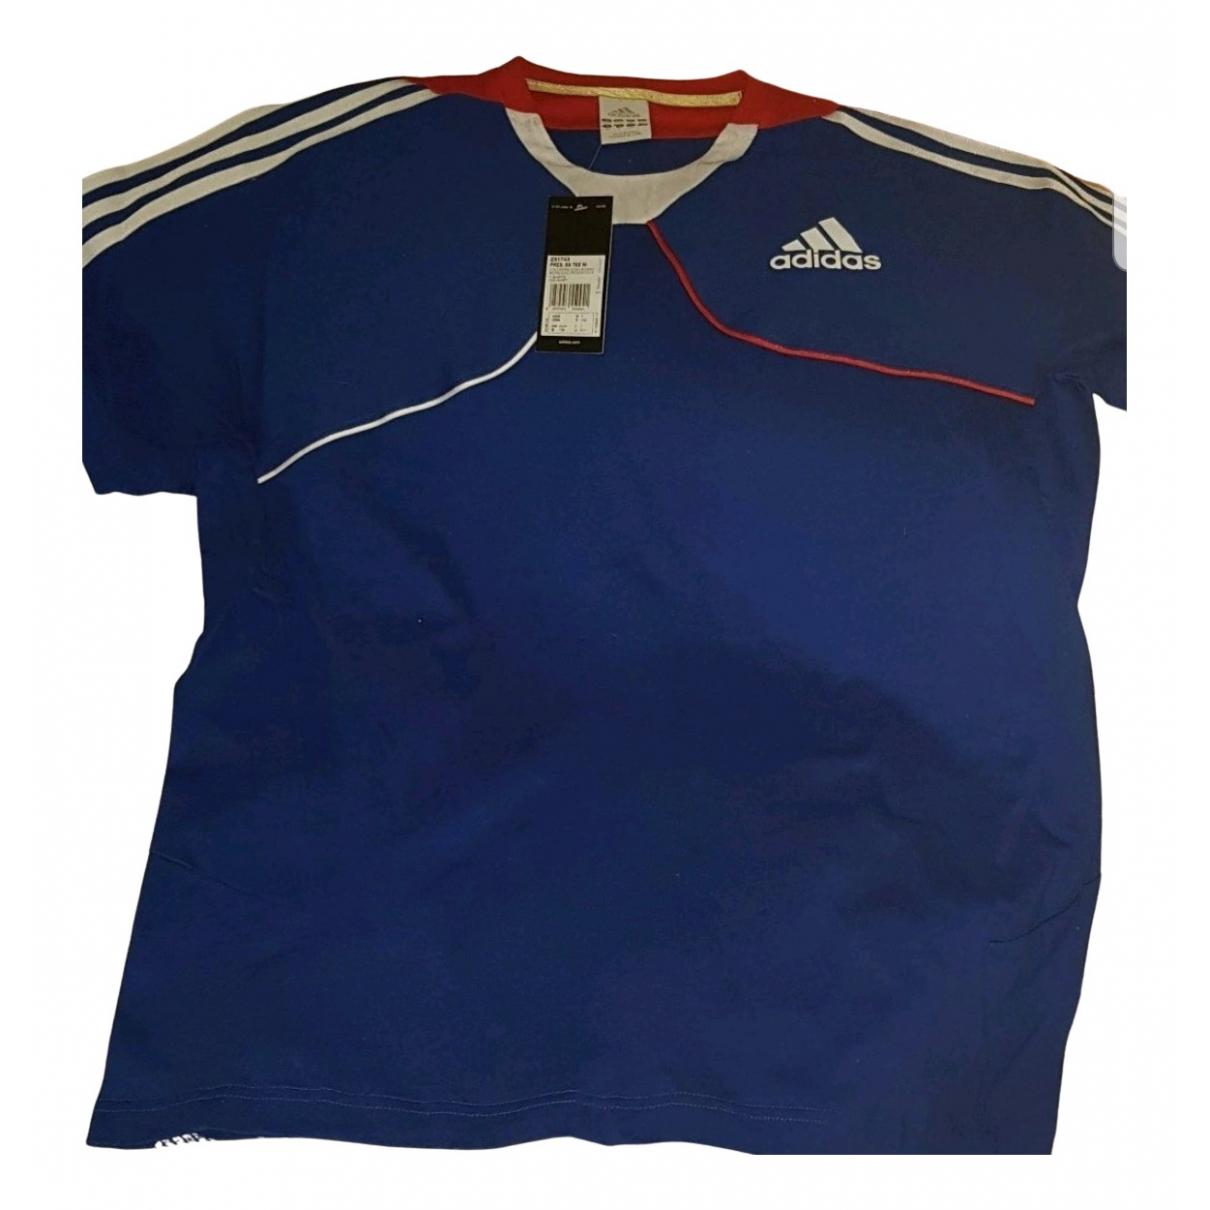 Adidas N Blue Cotton T-shirts for Men XL International